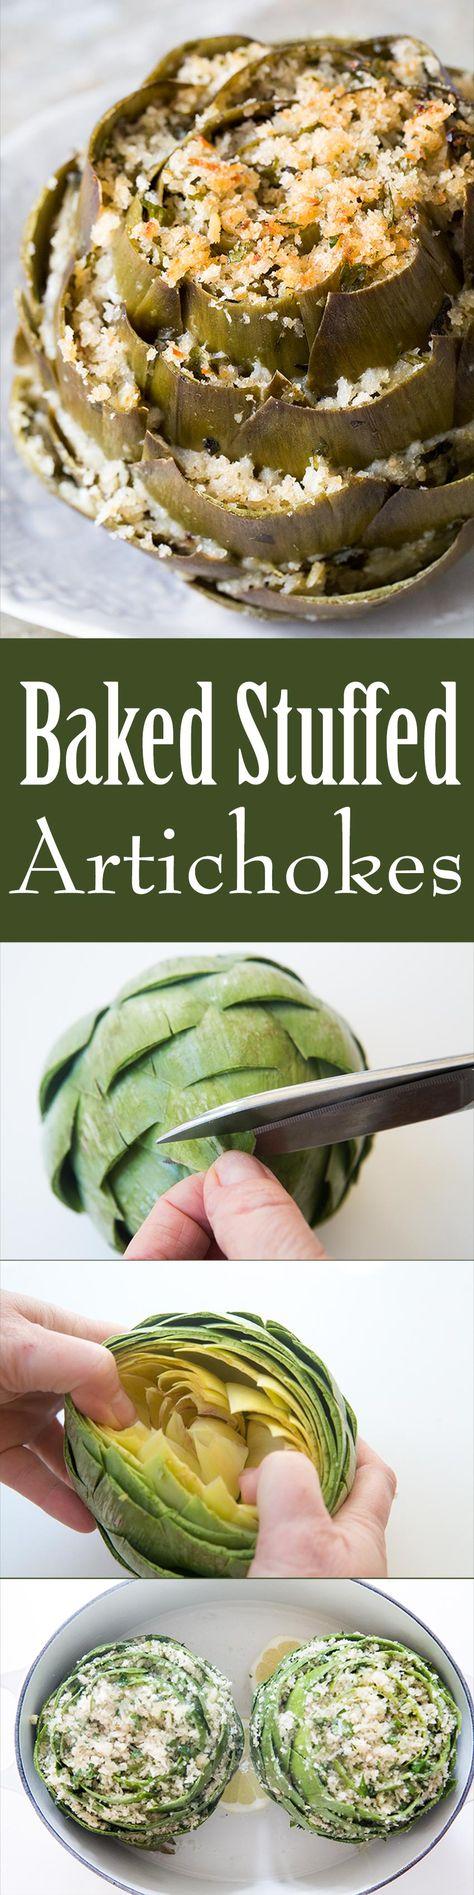 Stuffed artichokes are a perfect Easter artichoke appetizer! The ultimate stuffed artichoke recipe.